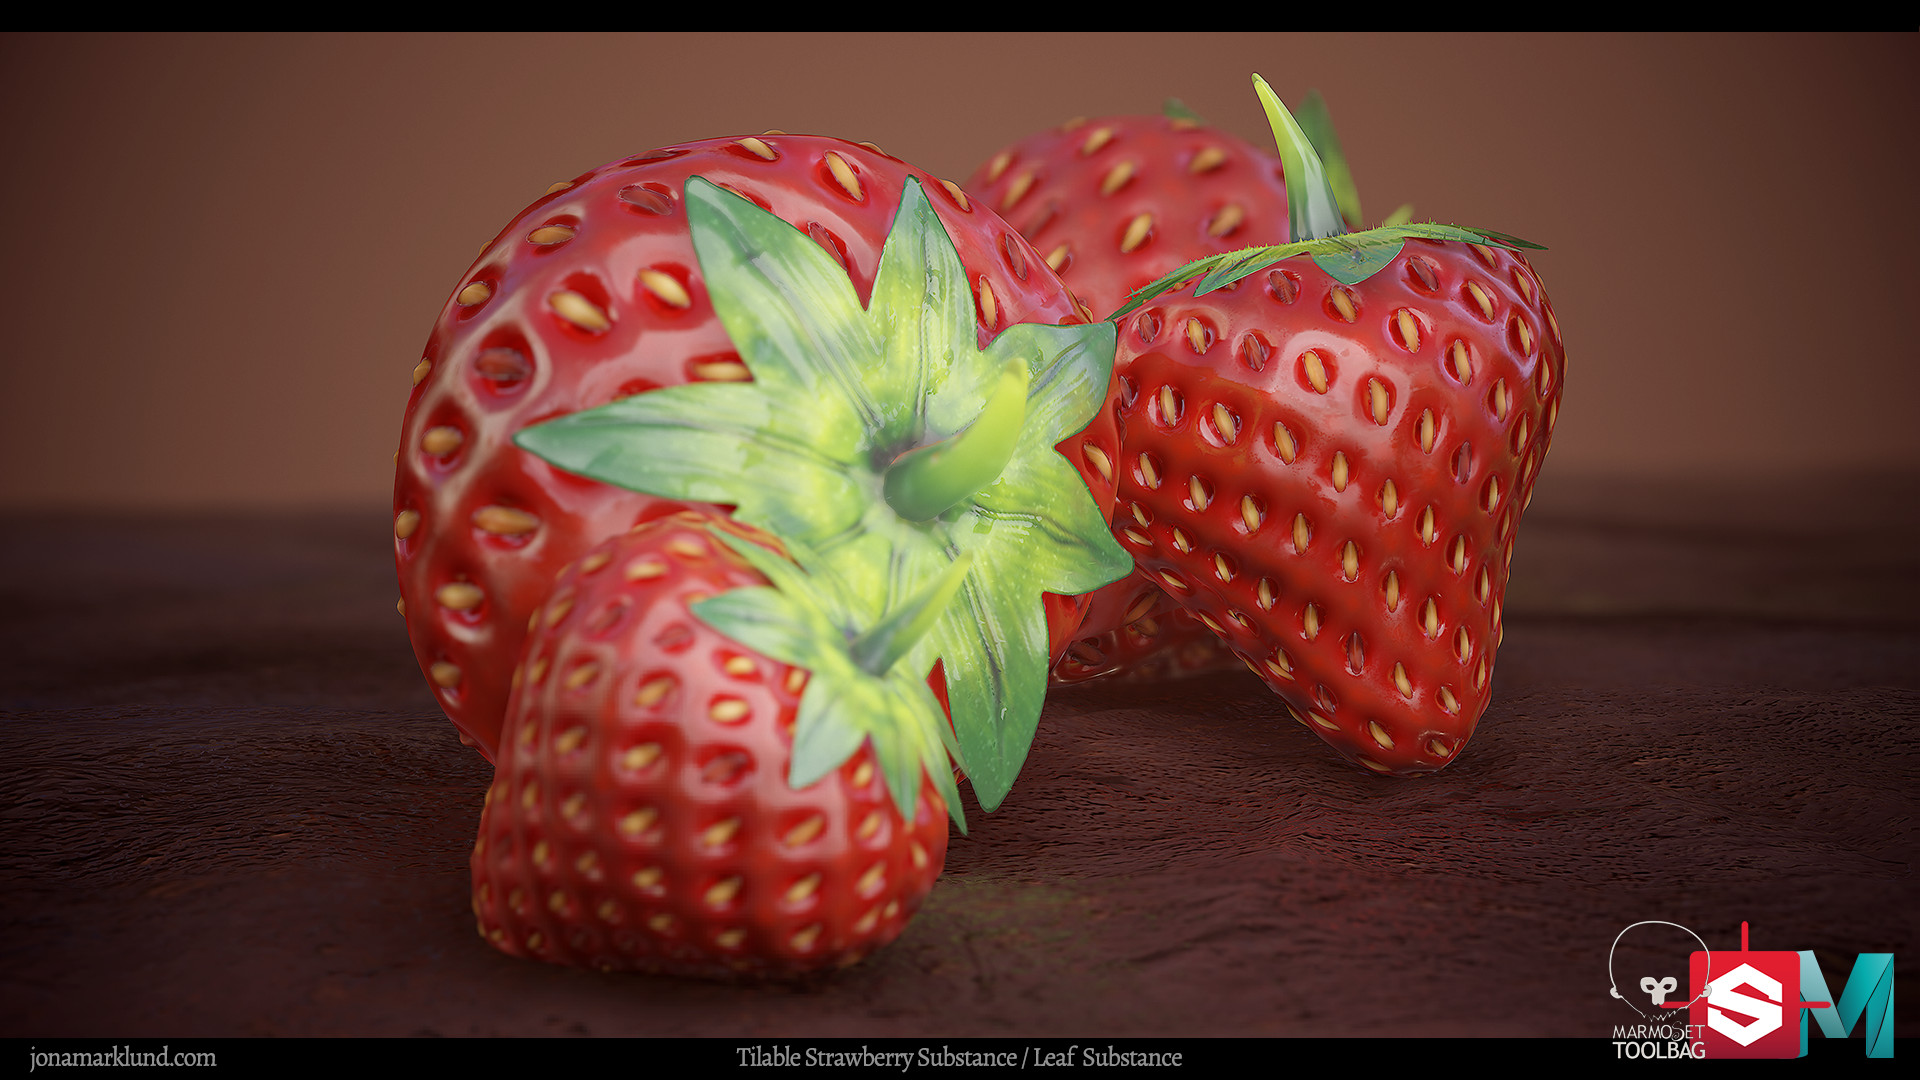 Jona marklund strawberrybeauty